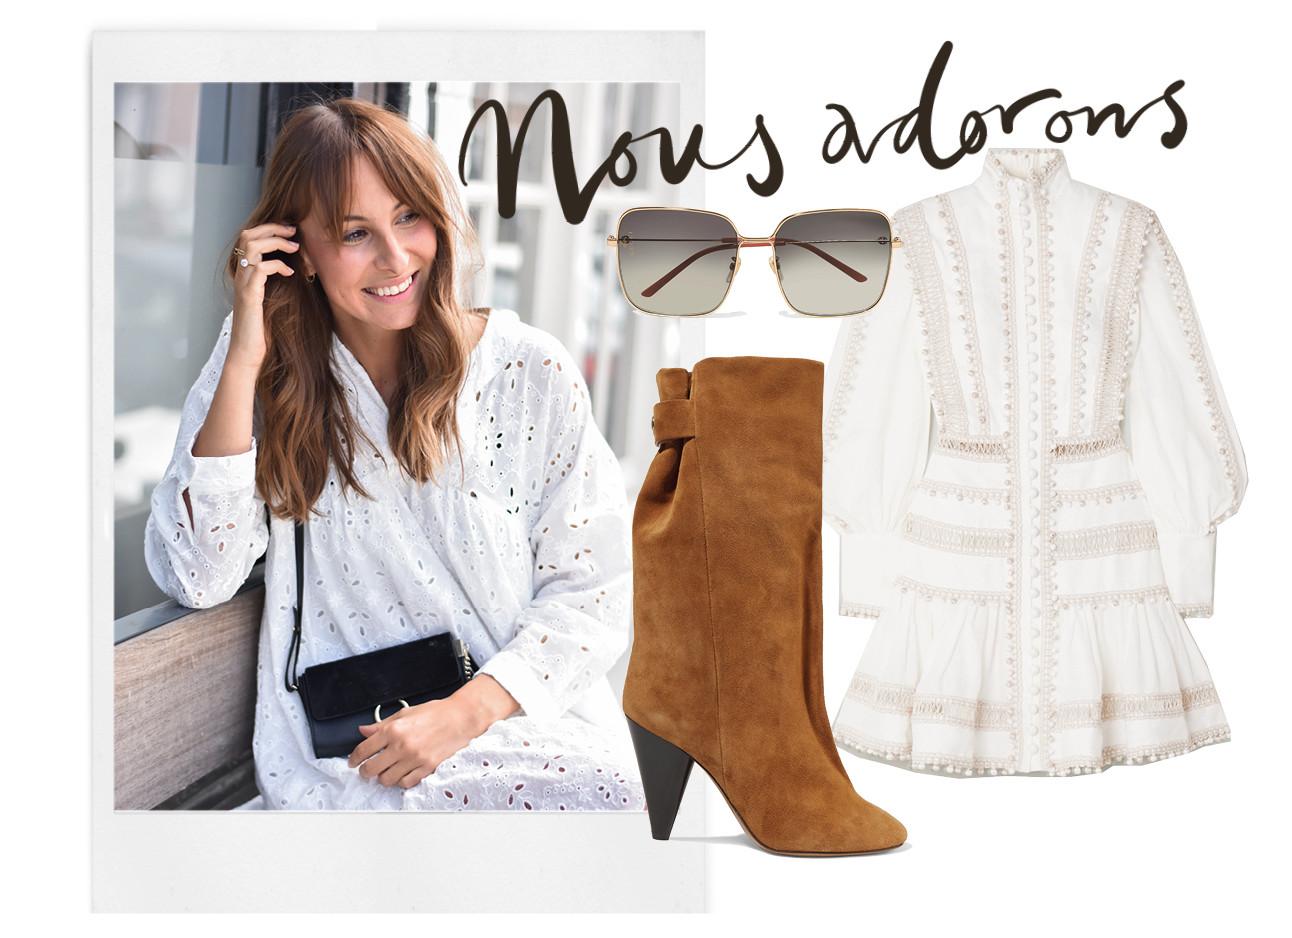 Lilian lachend met een wit jurkje aan en shopping beelden suede laarzen zonnebril en jurk